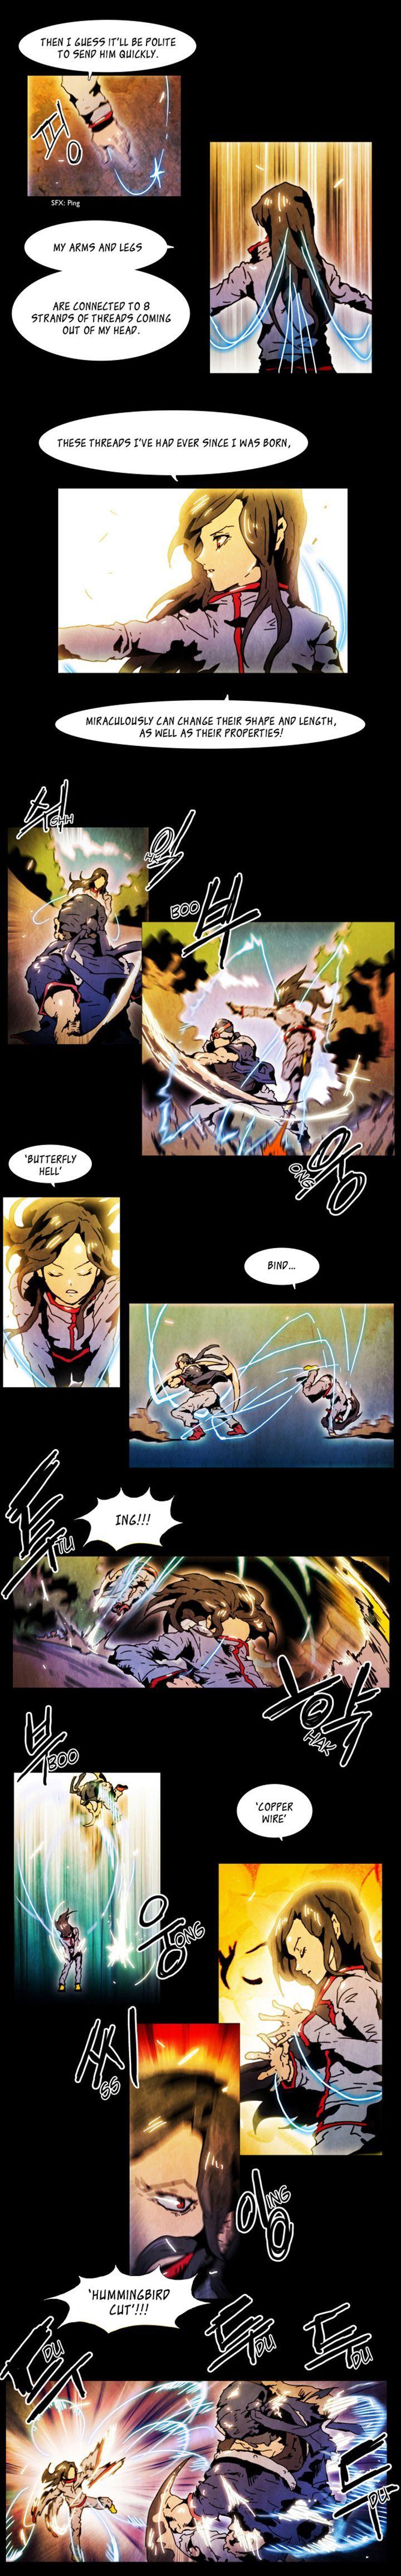 Black Behemoth 4 Page 2